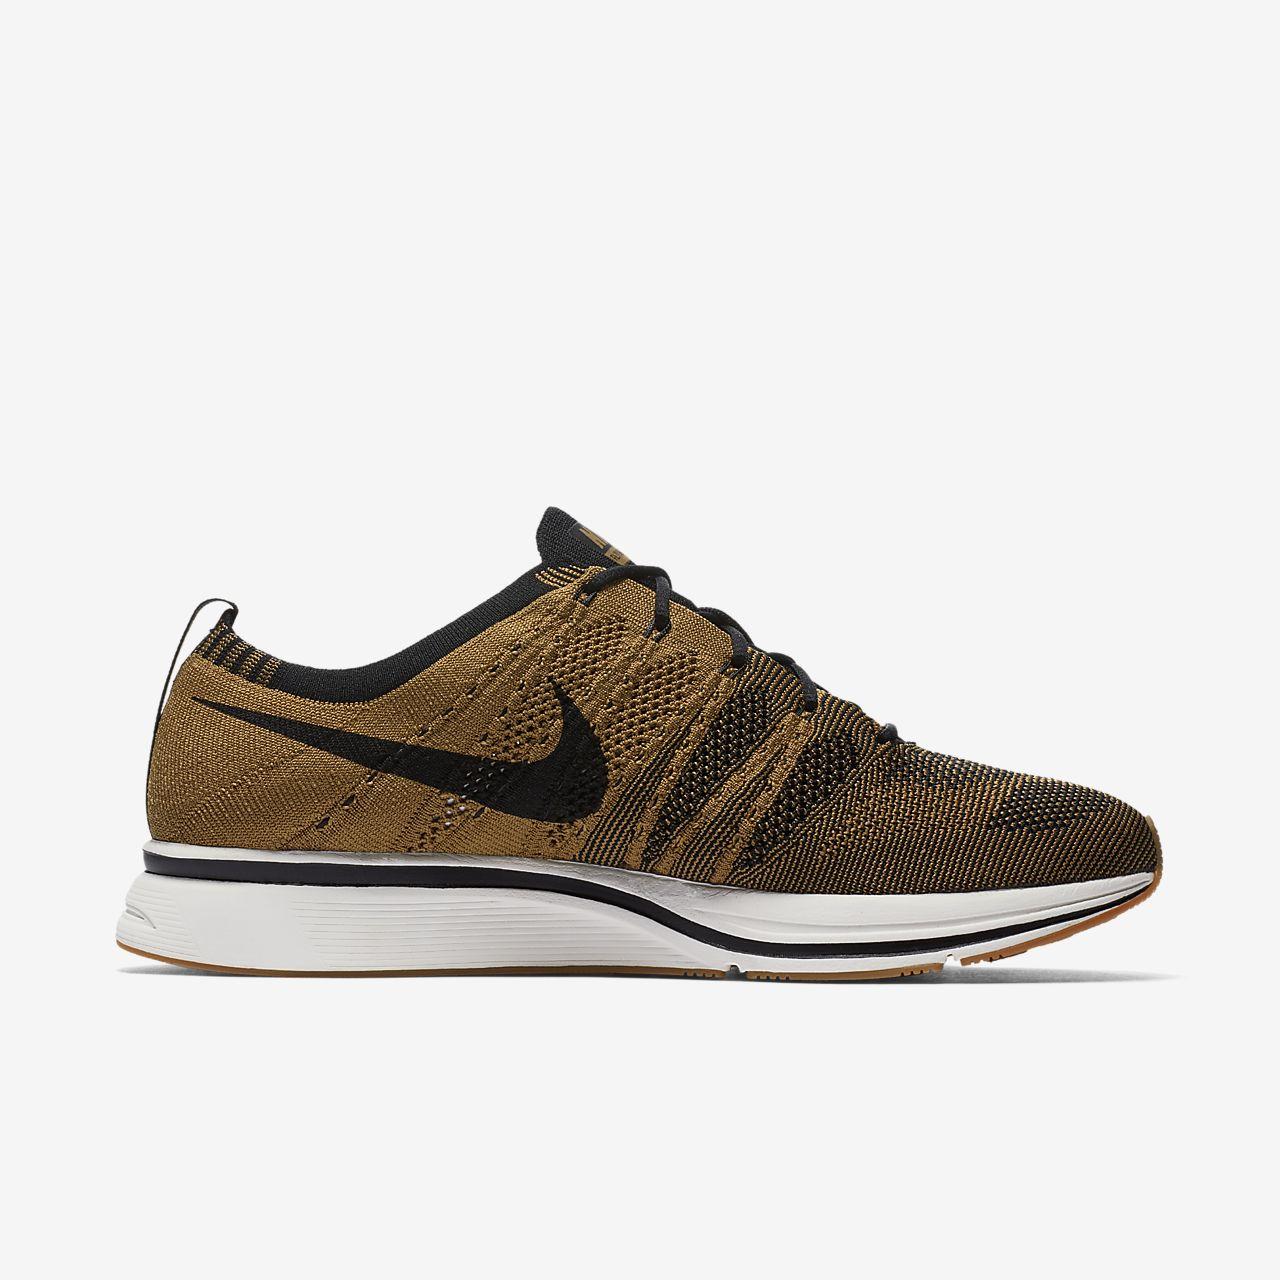 24b2689efcf Nike Flyknit Trainer Unisex Shoe. Nike.com